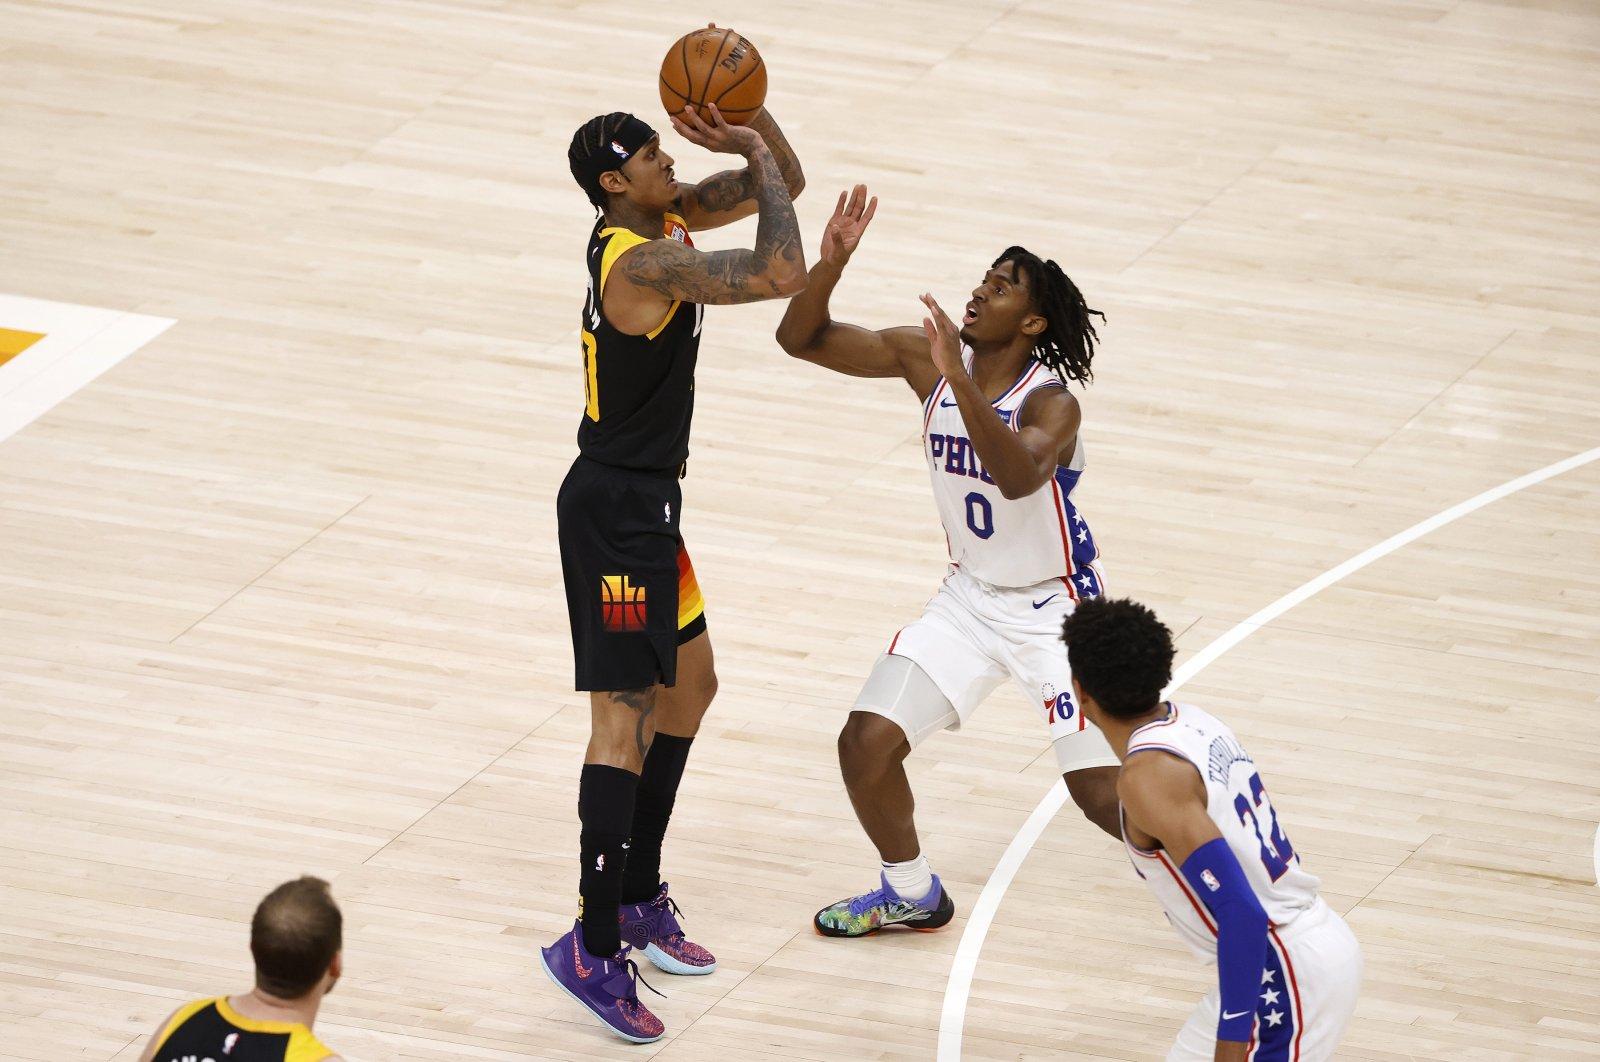 Utah Jazz guard Jordan Clarkson (L) looks to shoot as Philadelphia 76ers guard Tyrese Maxey (R) looks to defend at Vivint Smart Home Arena, Salt Lake City, Utah, Feb 15, 2021. (Reuters Photo)